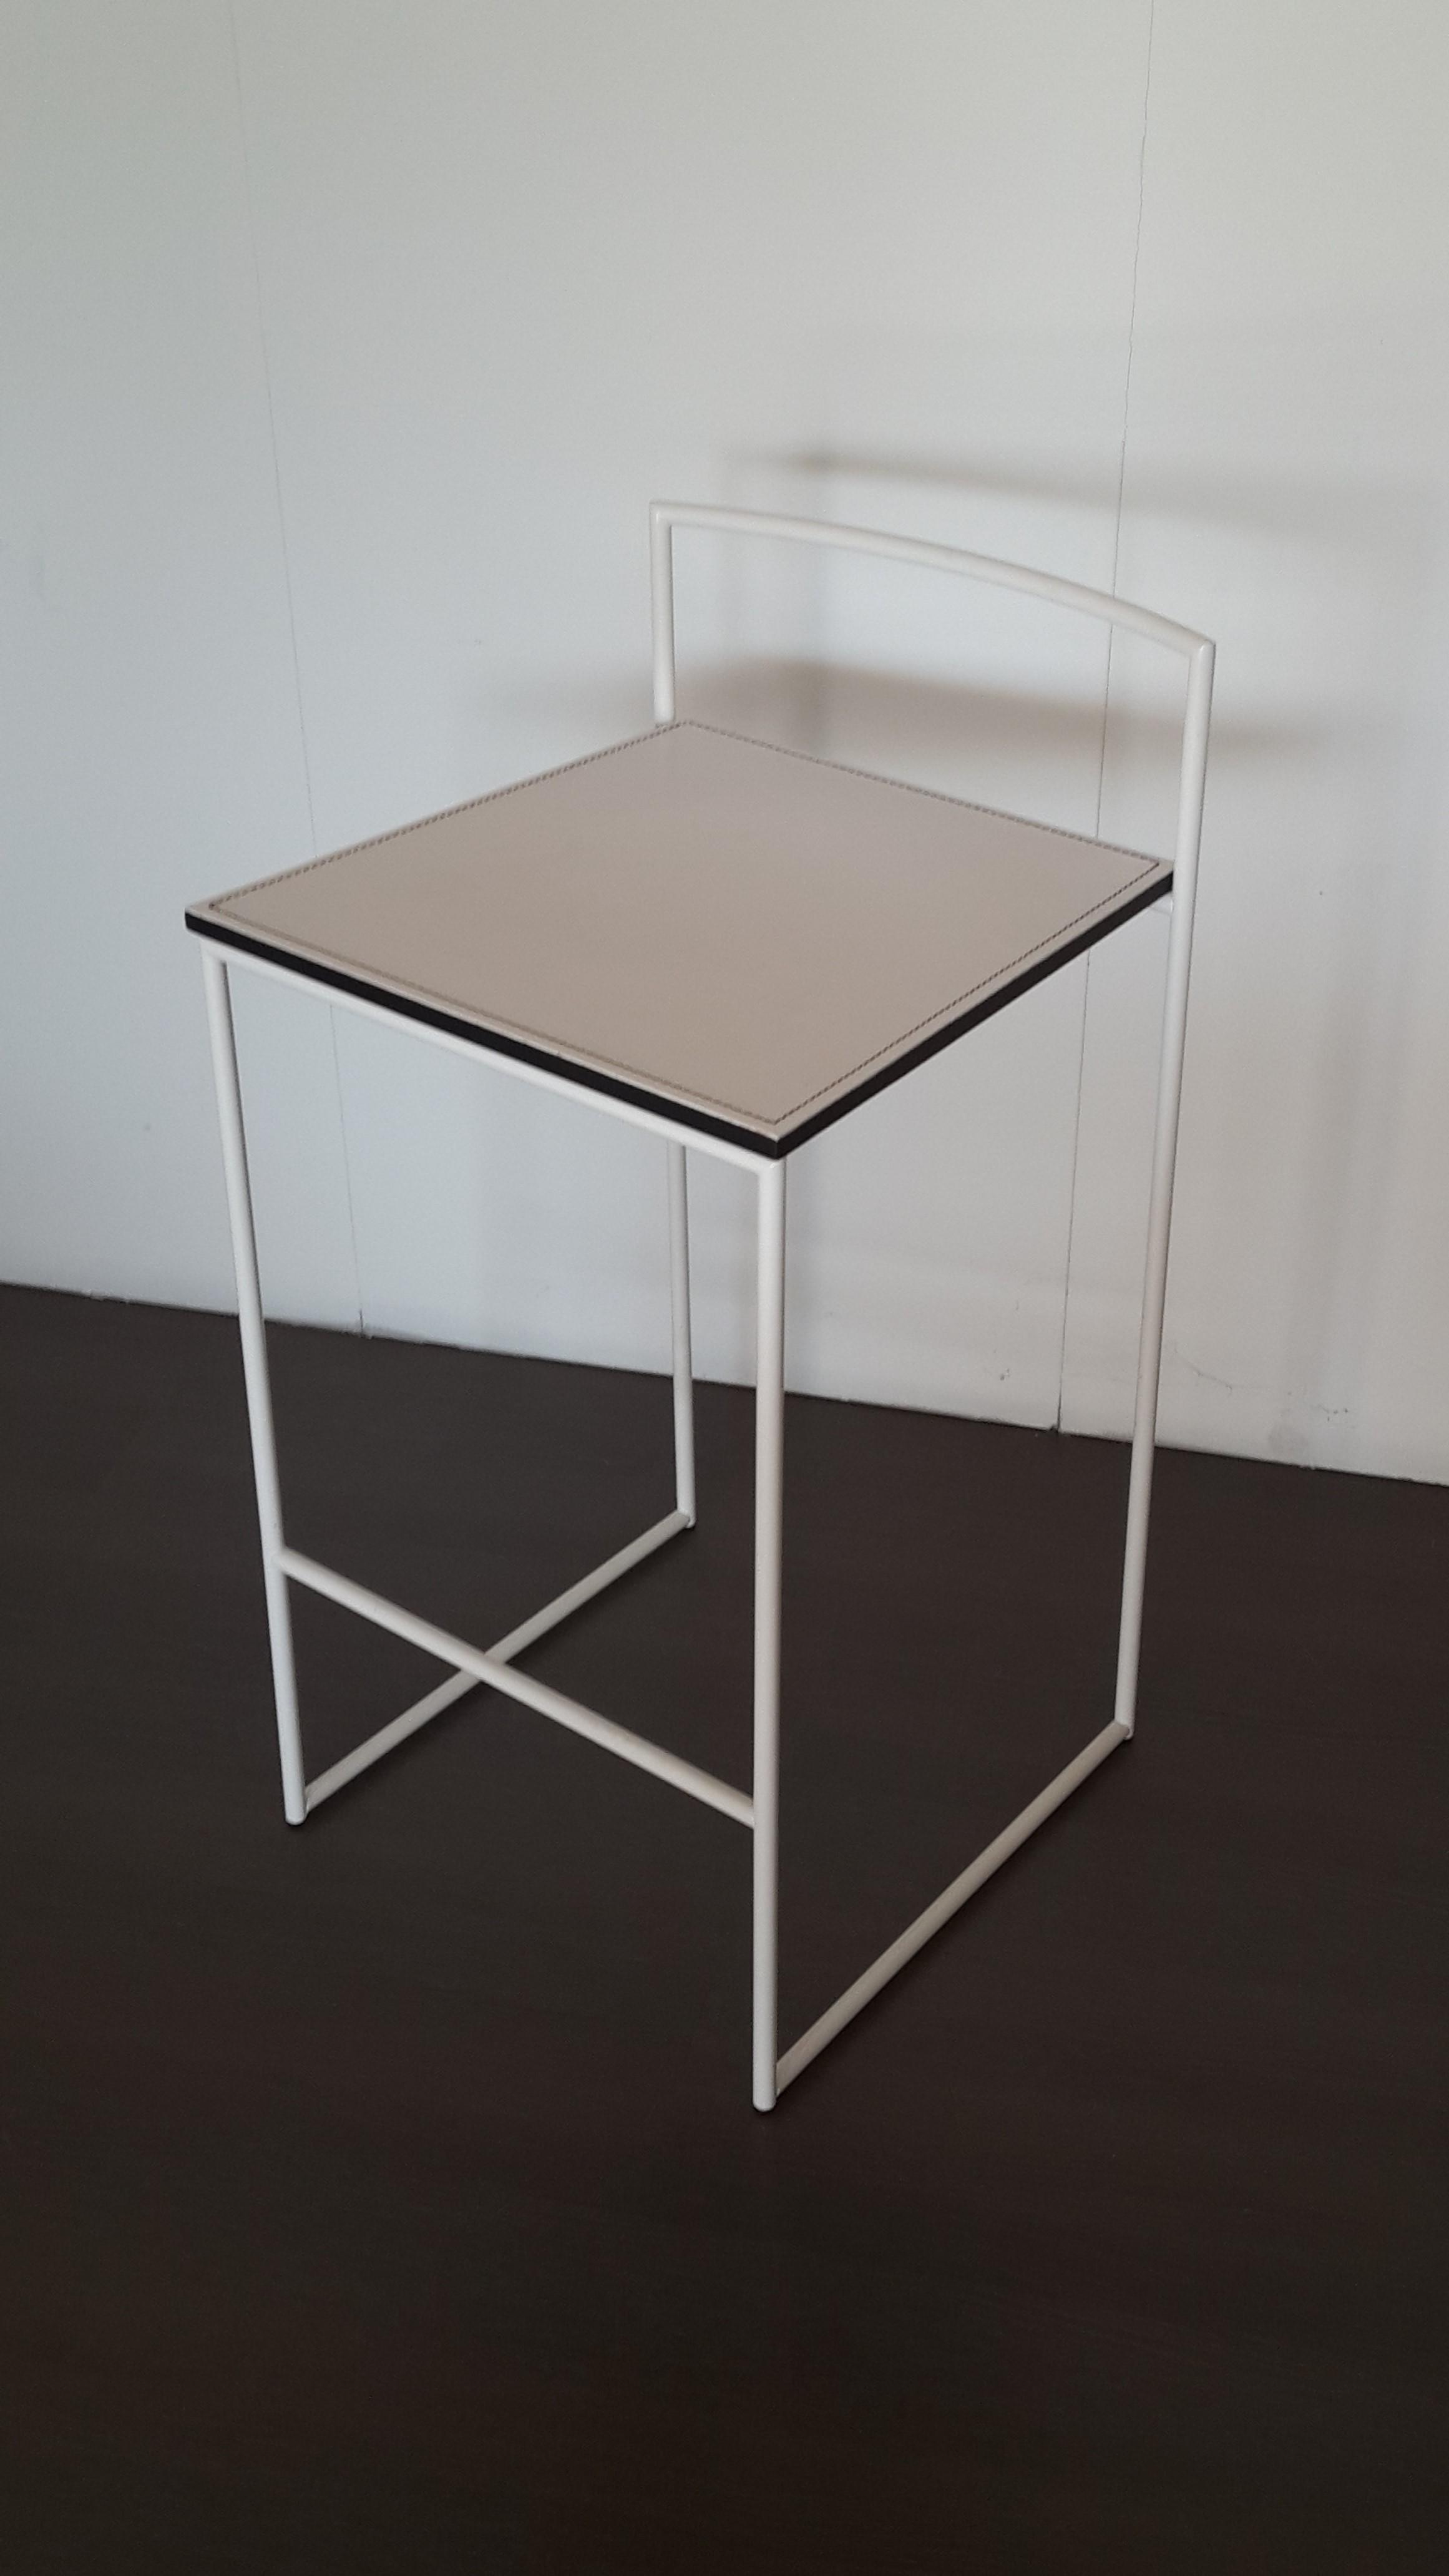 Sgabelli cucina sgabelli bar sedia sgabello bar cucina for Sgabelli cucina regolabili